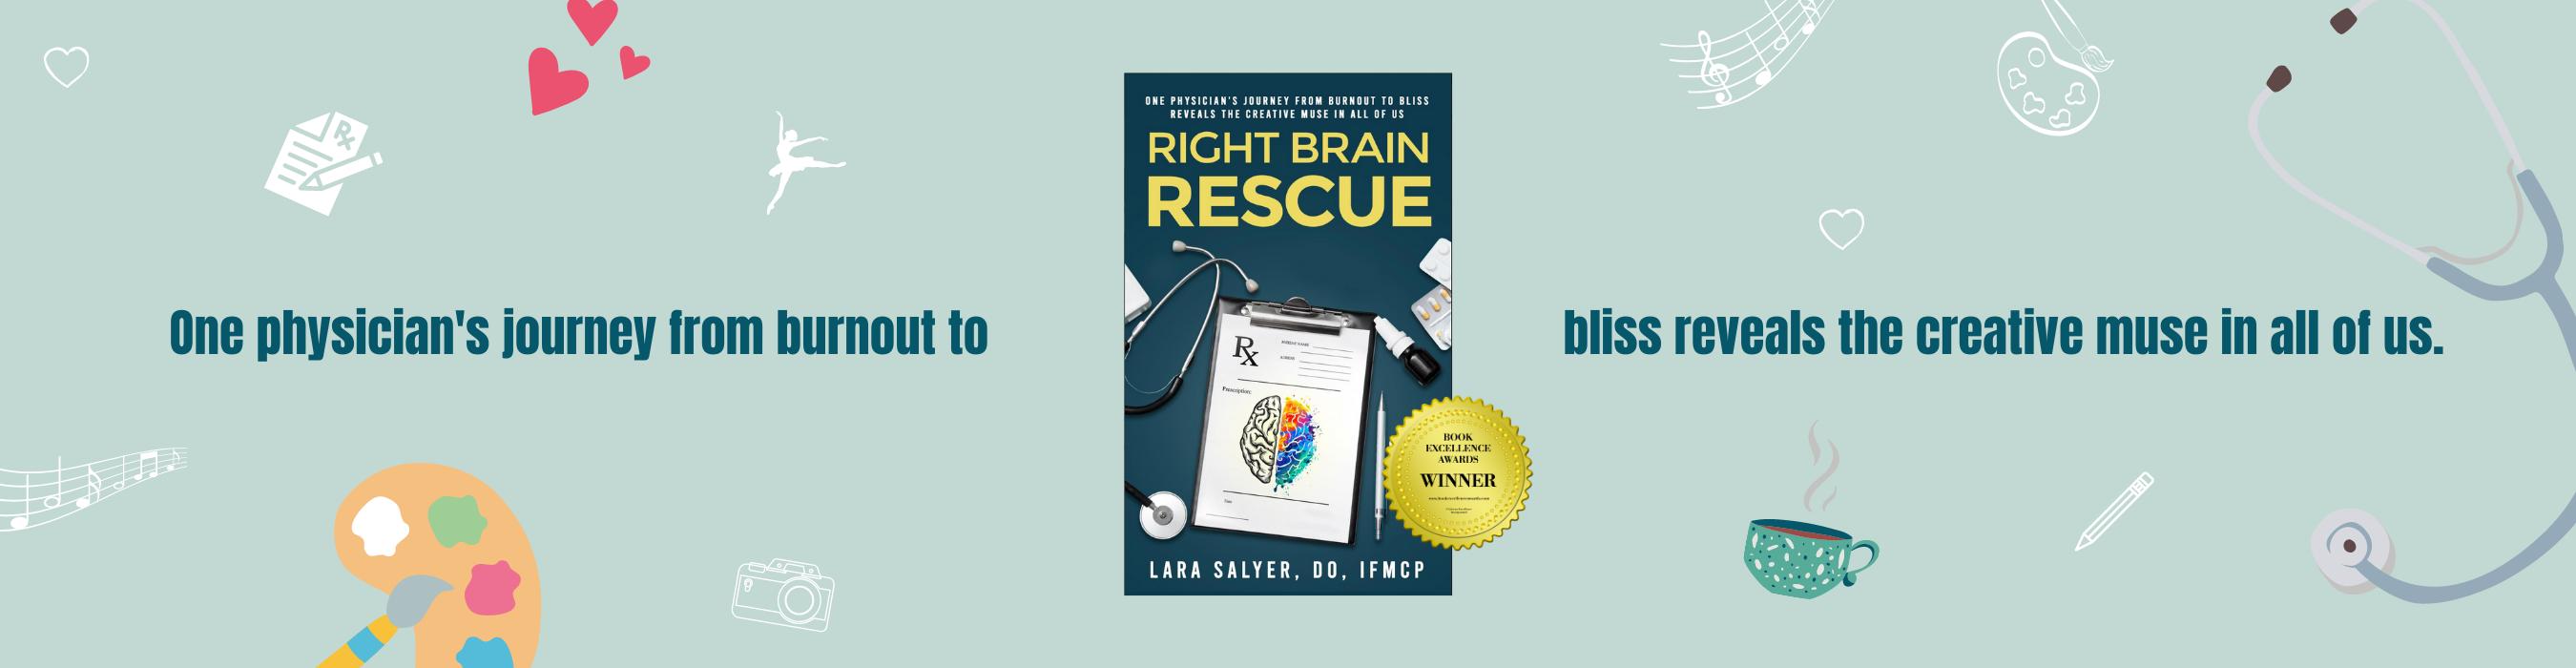 Website Right Brain Rescue Book Award Winner 02